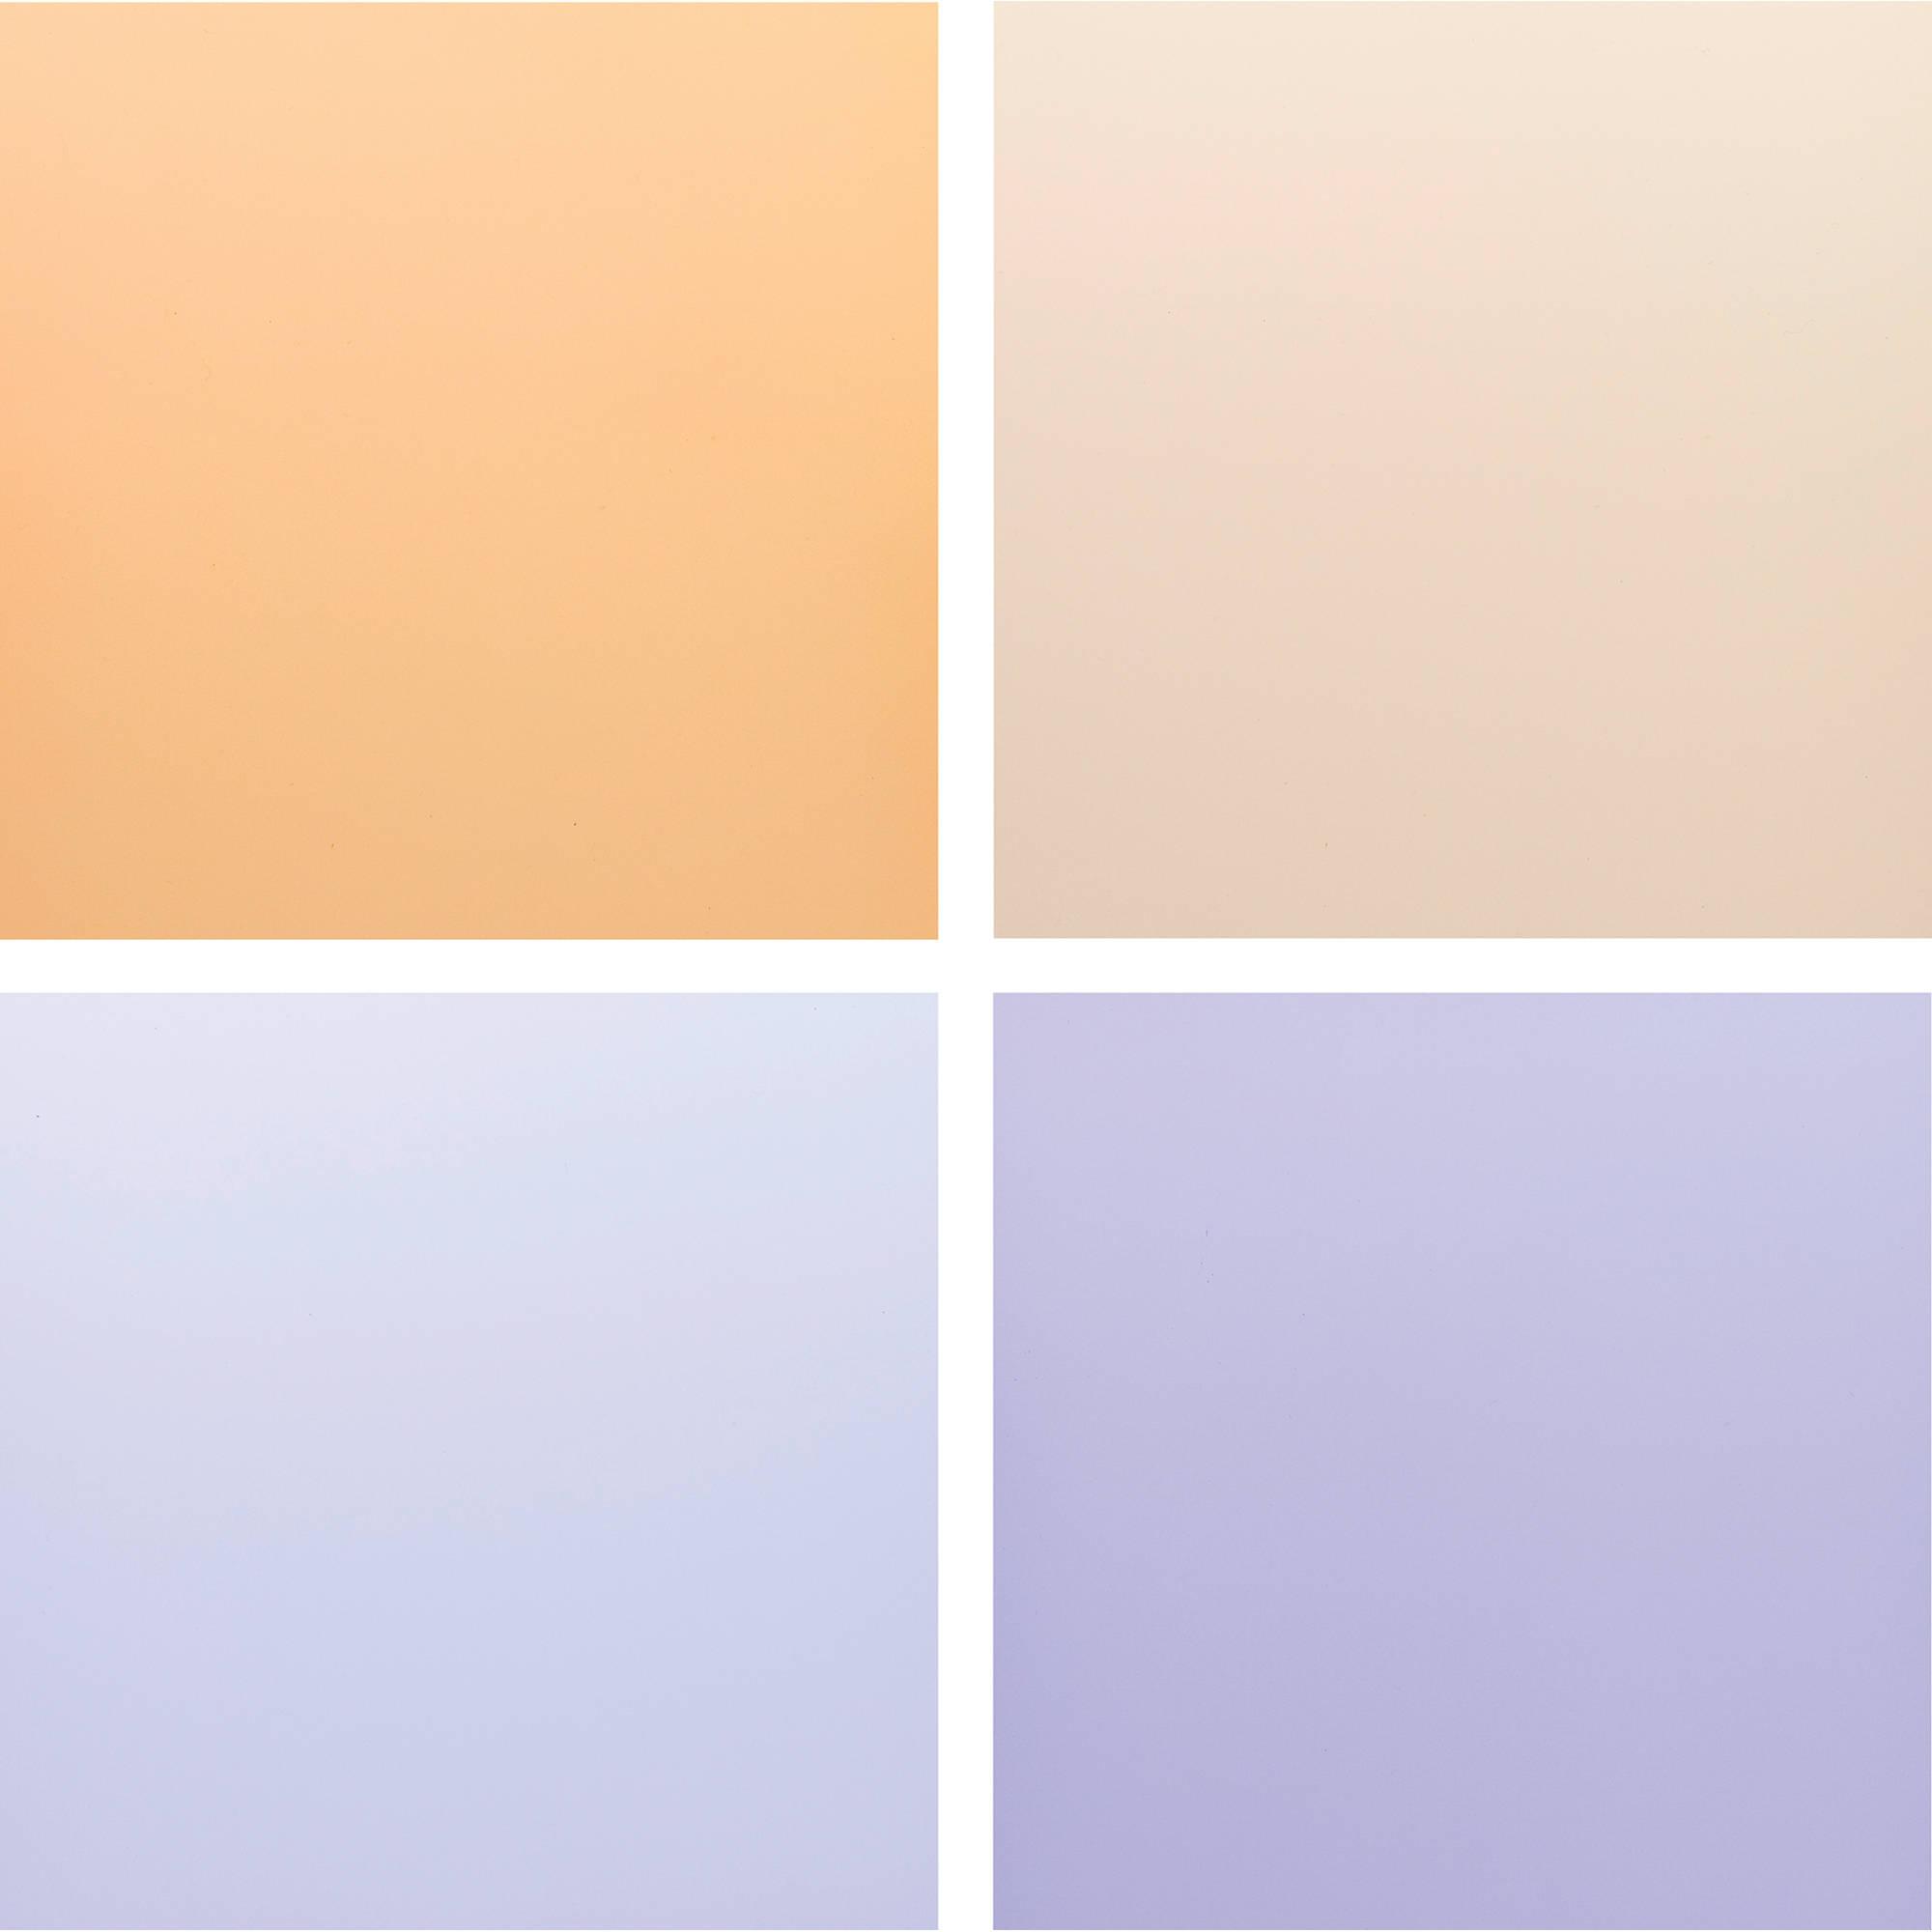 Home Theater Light Color Temperature: Formatt Hitech Color Temperature Camera Filter Kit